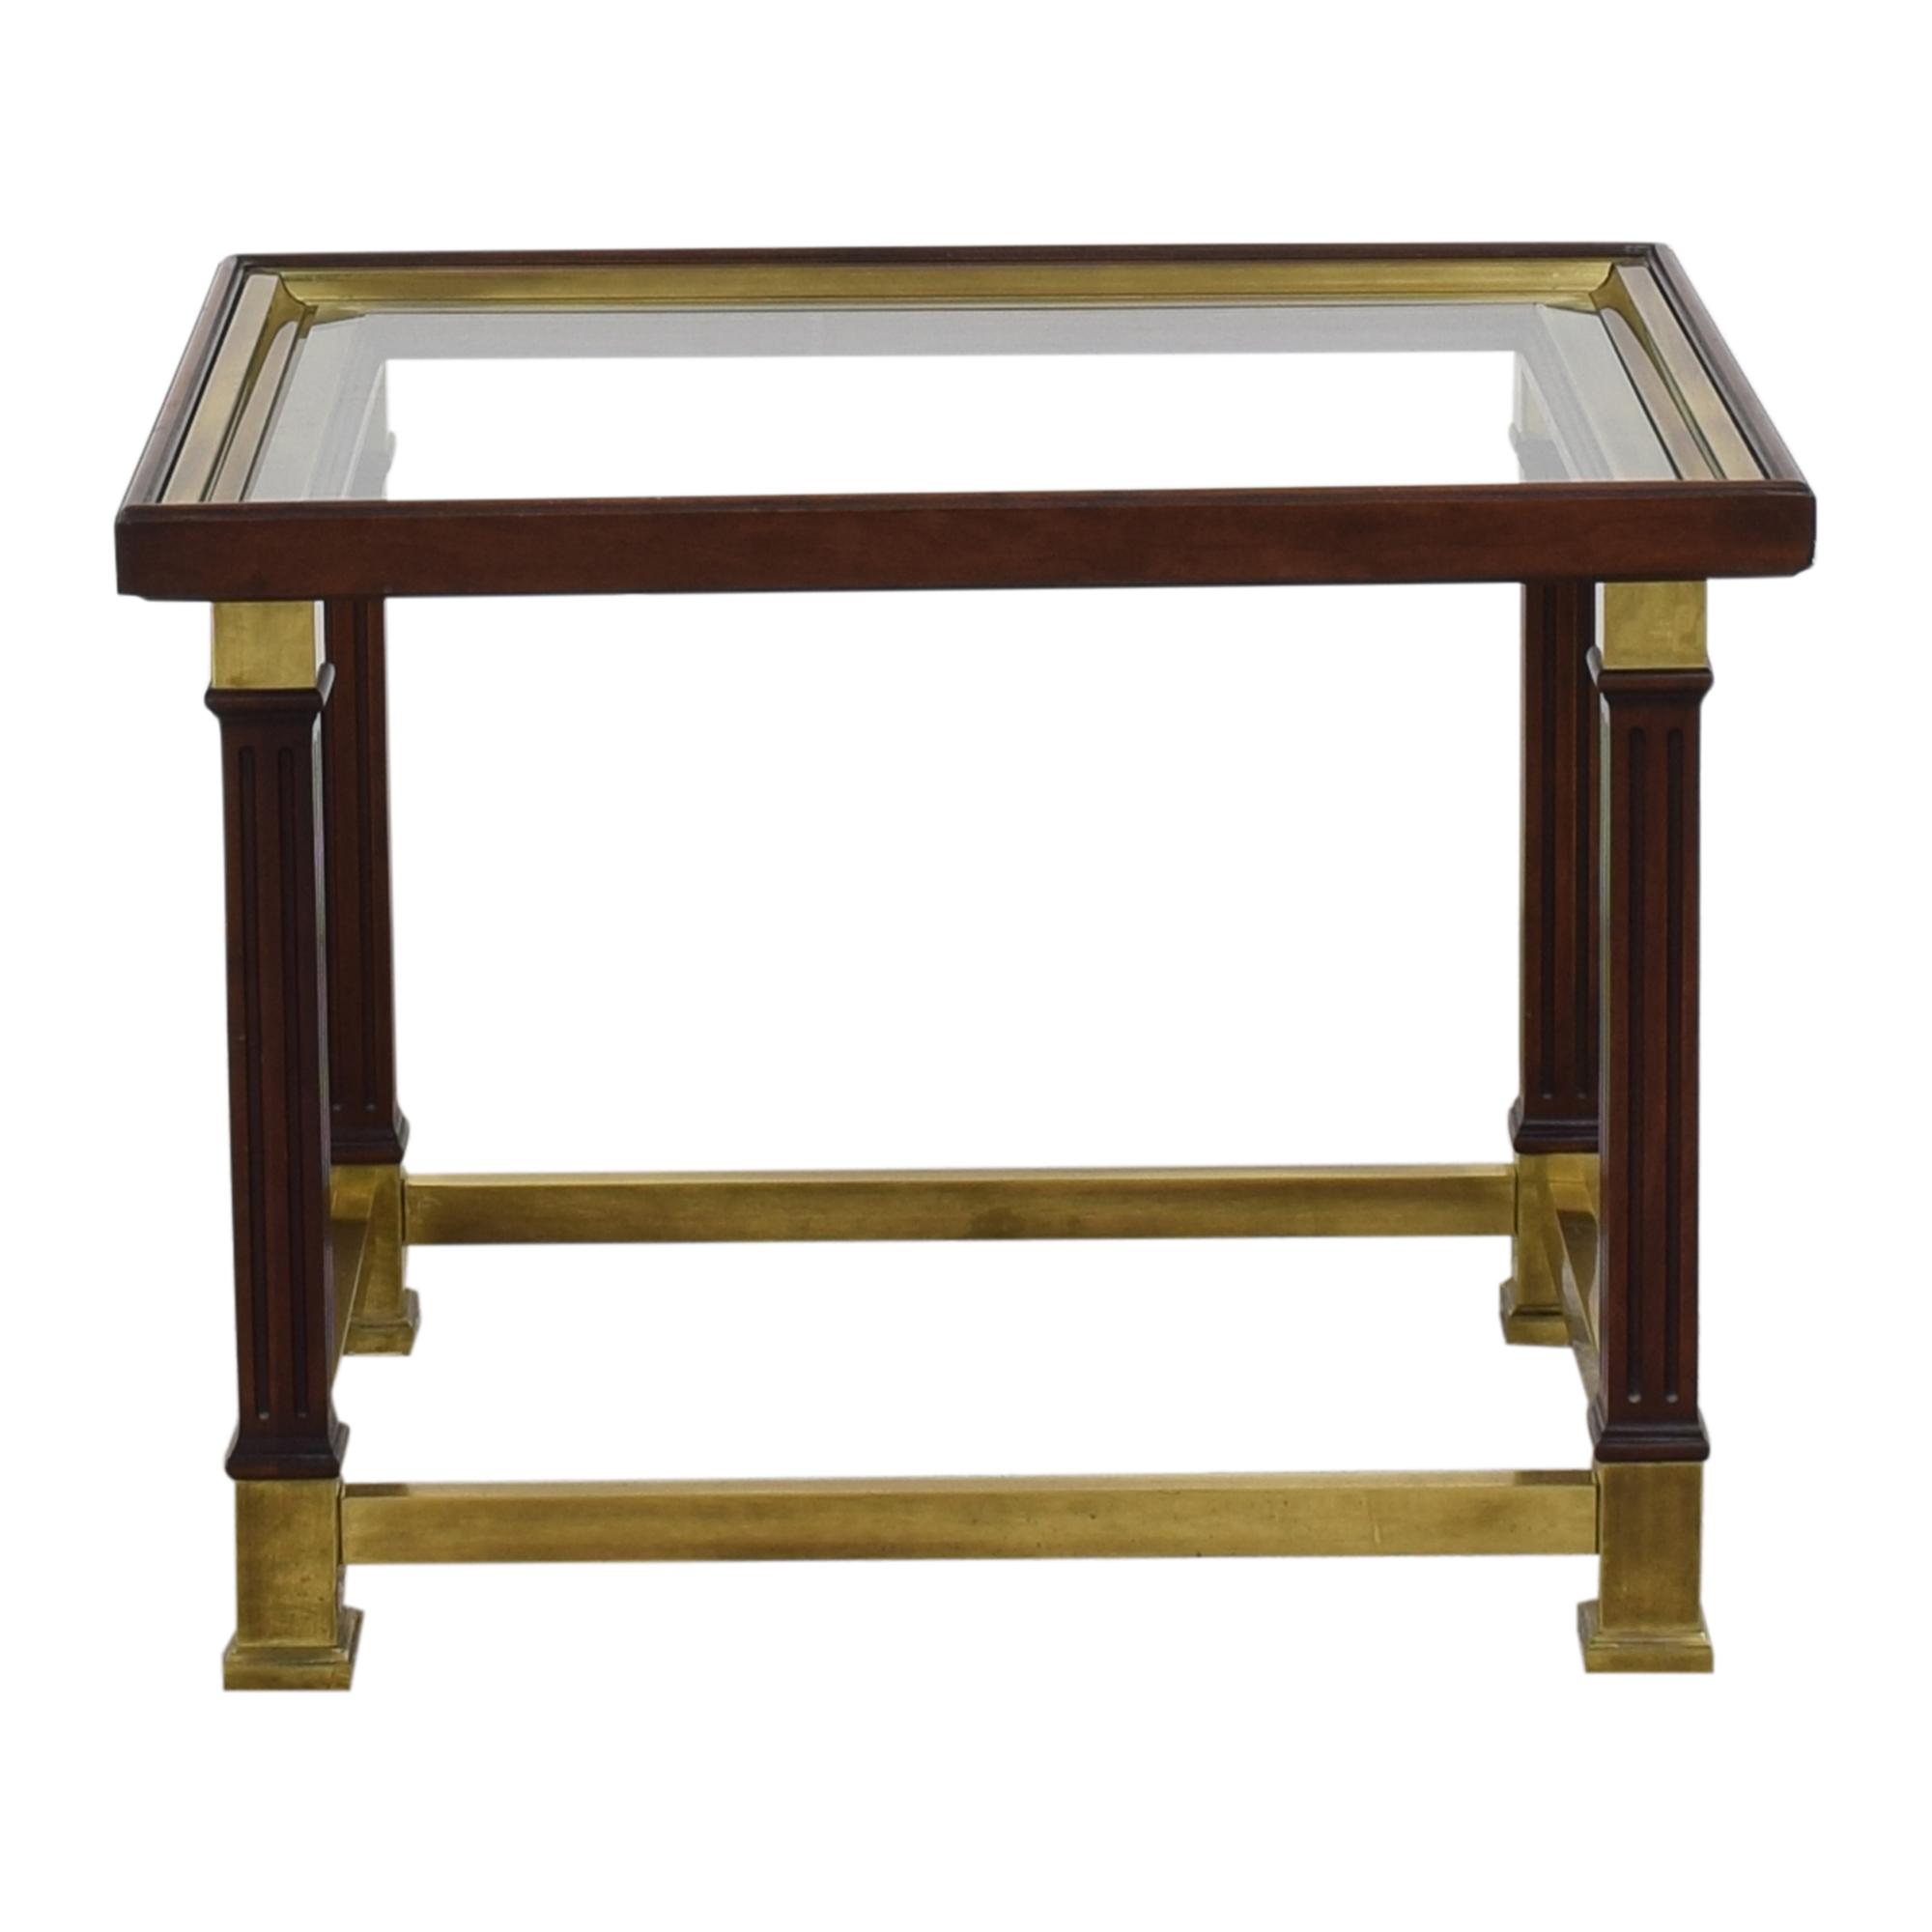 Transparent End Table for sale